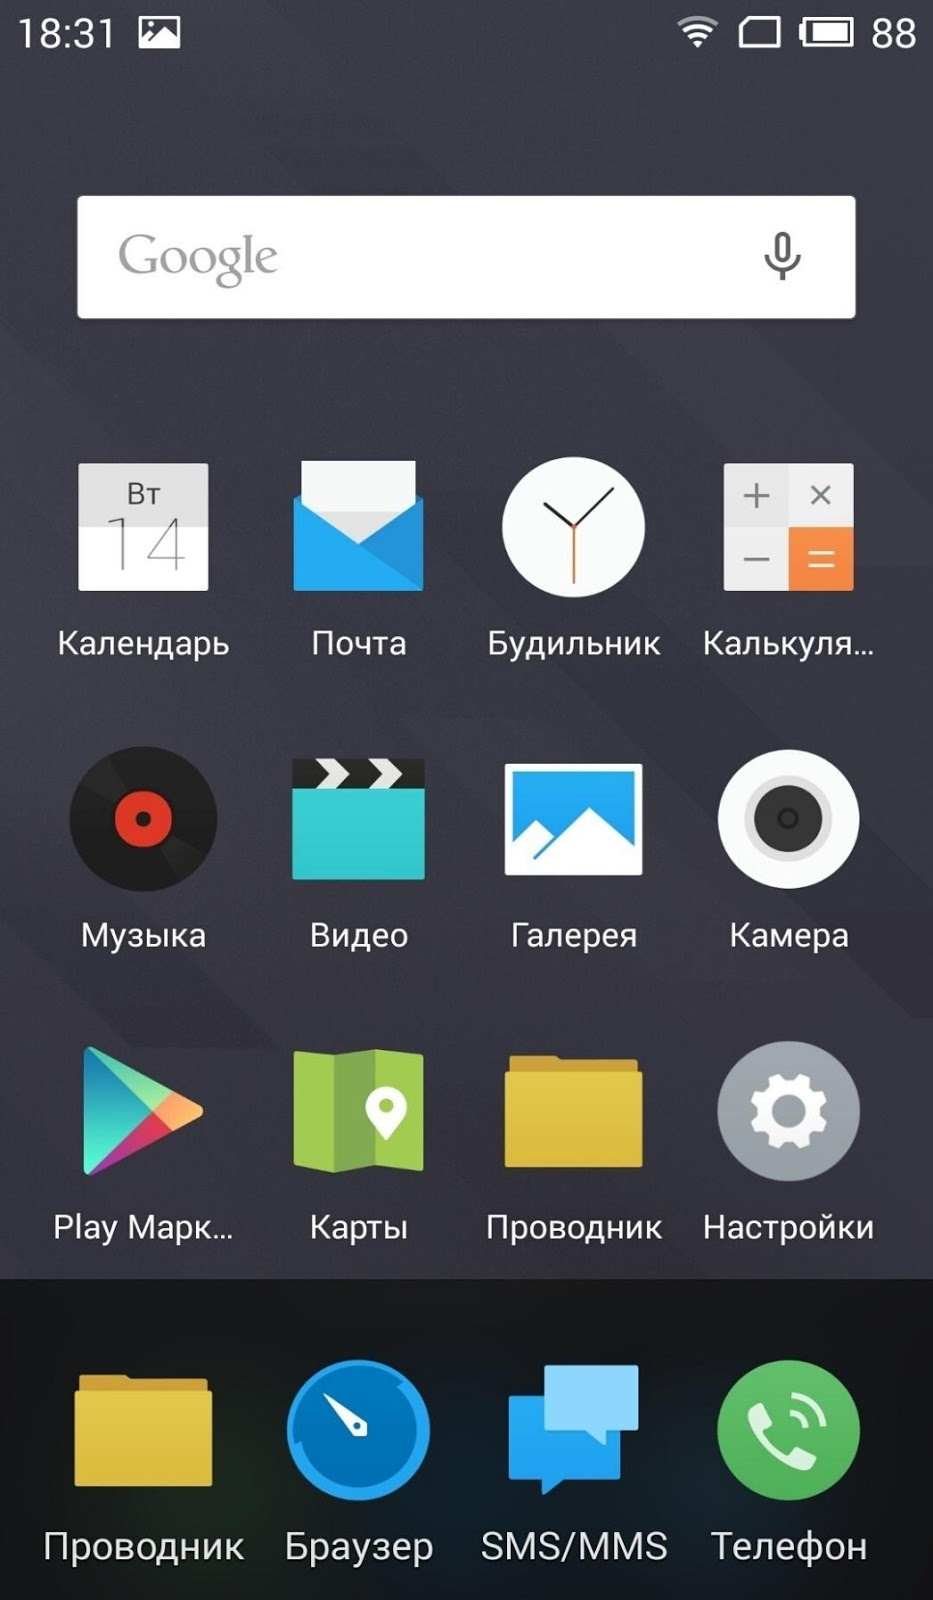 C:Users-Desktopскачанные файлы (8).jpg